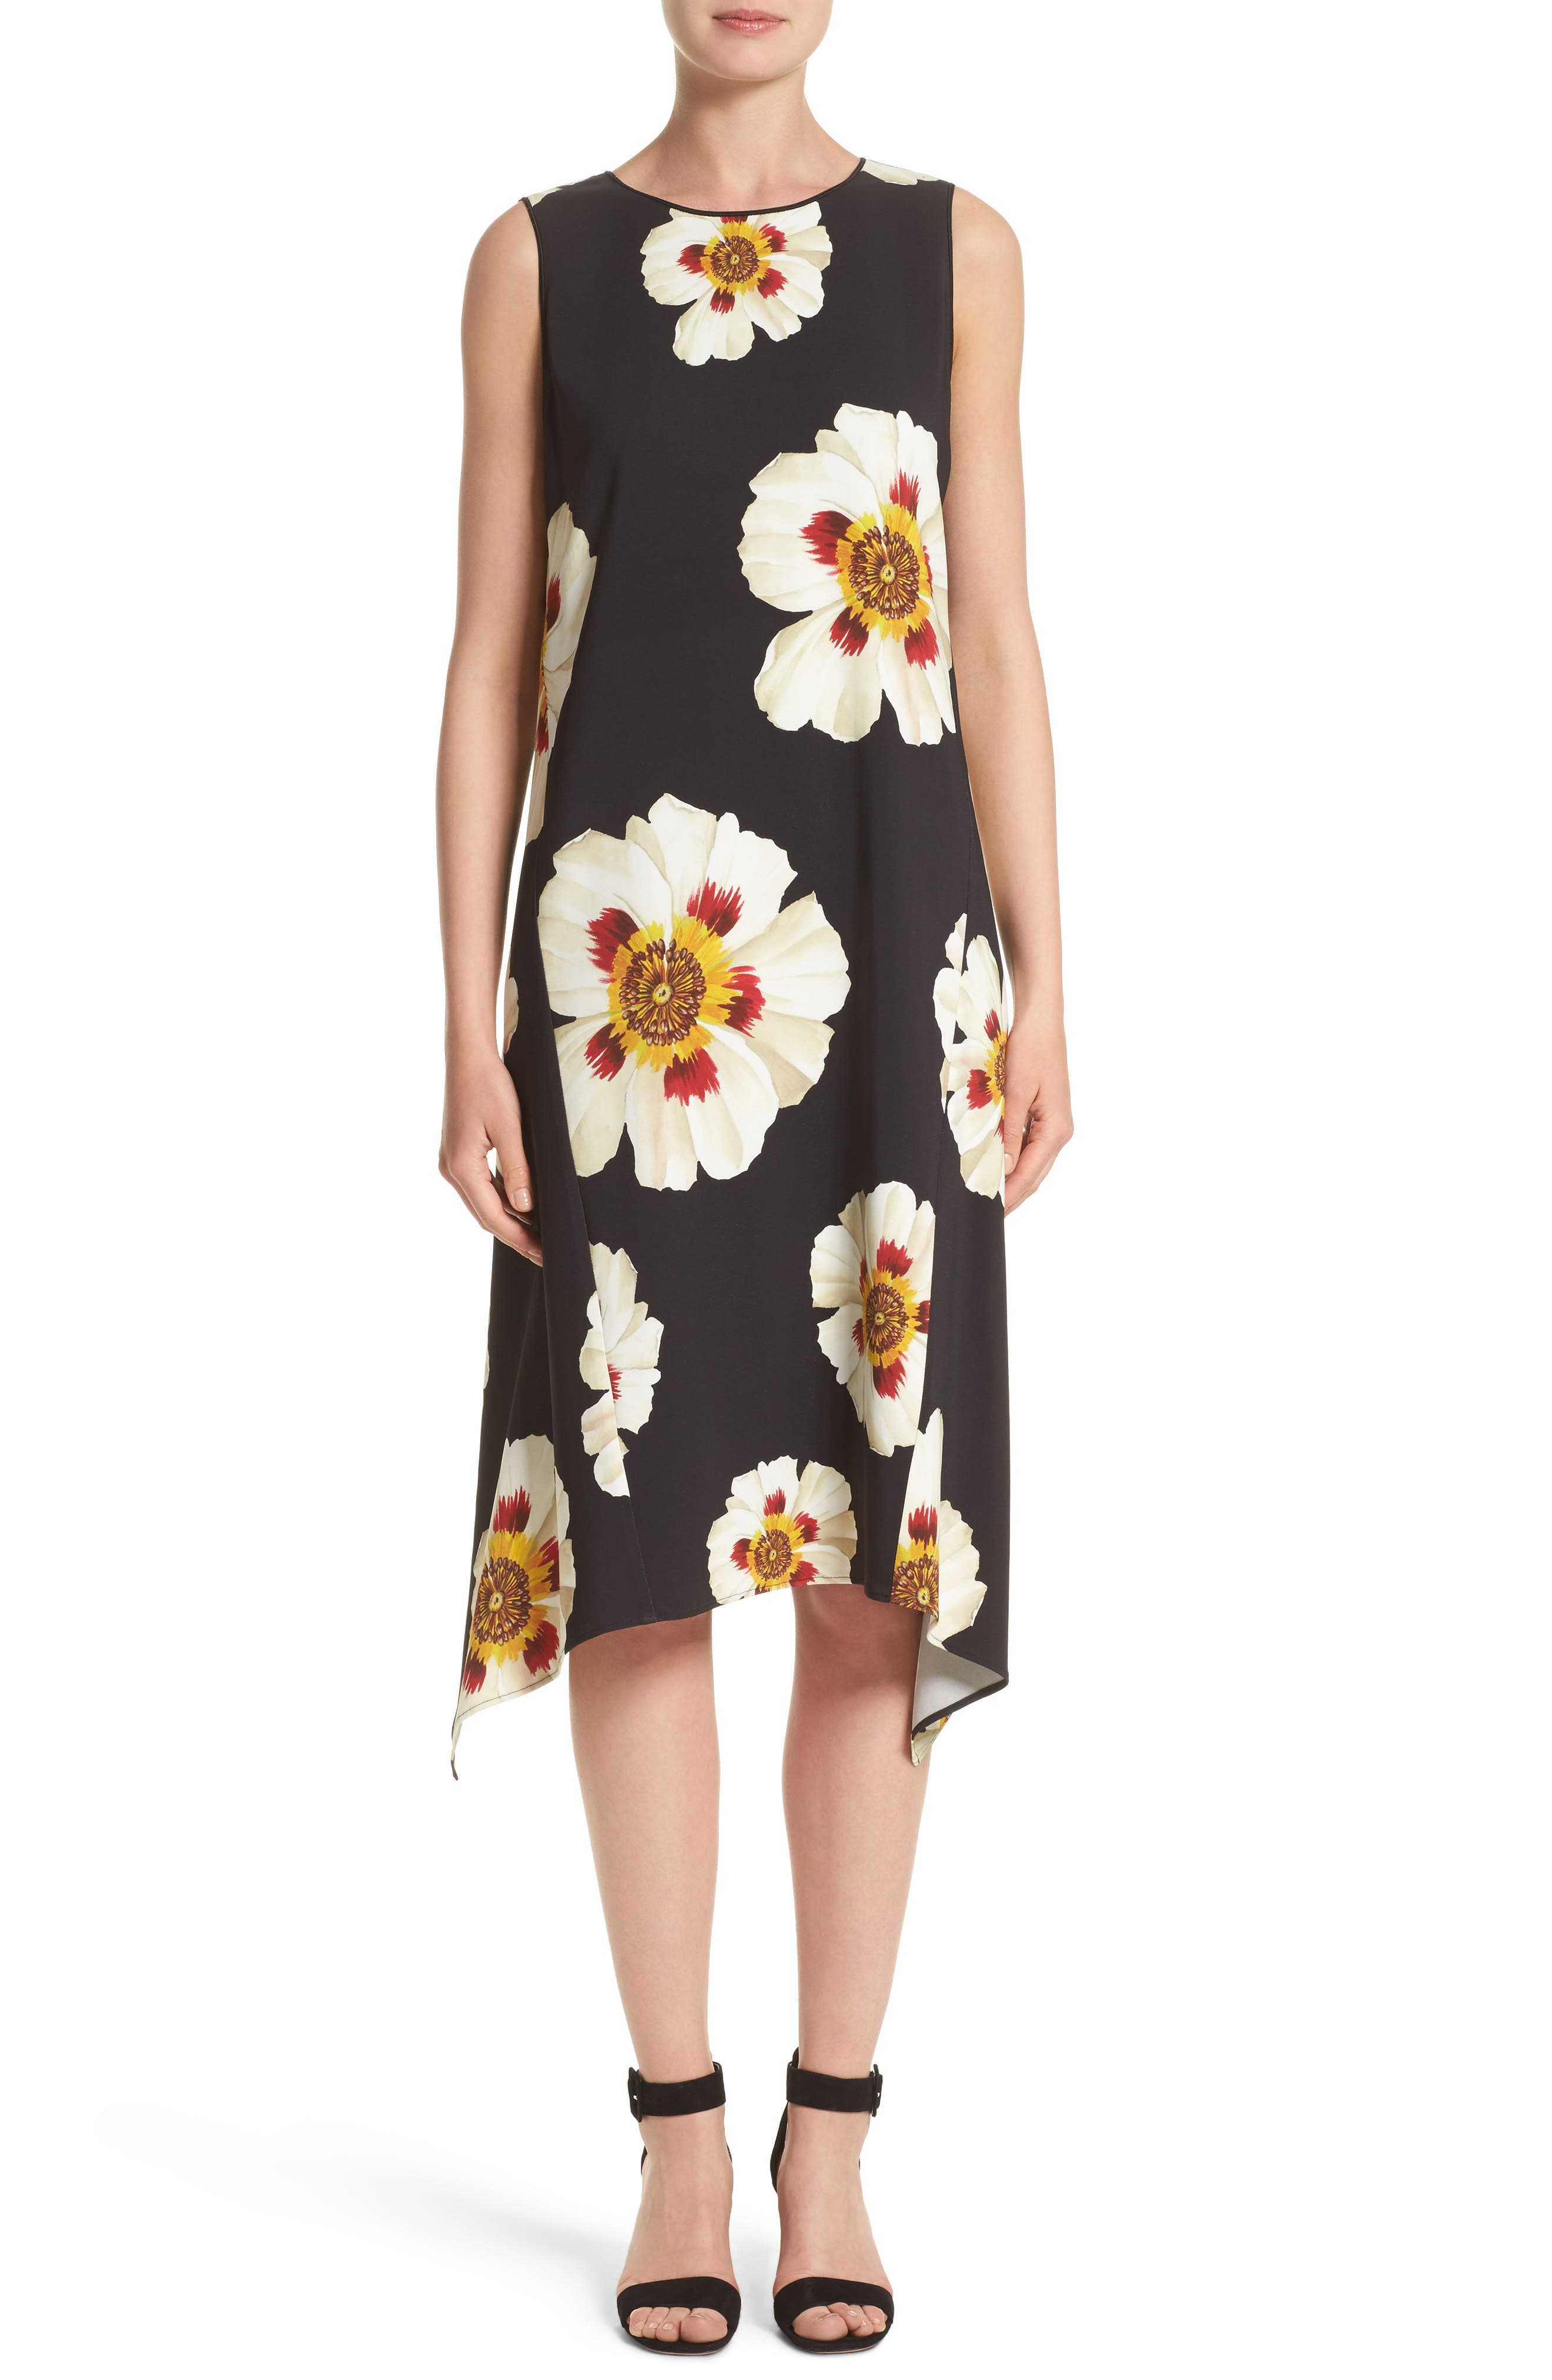 Romona Floral Fluid Cloth Dress,                         Main,                         color, 001